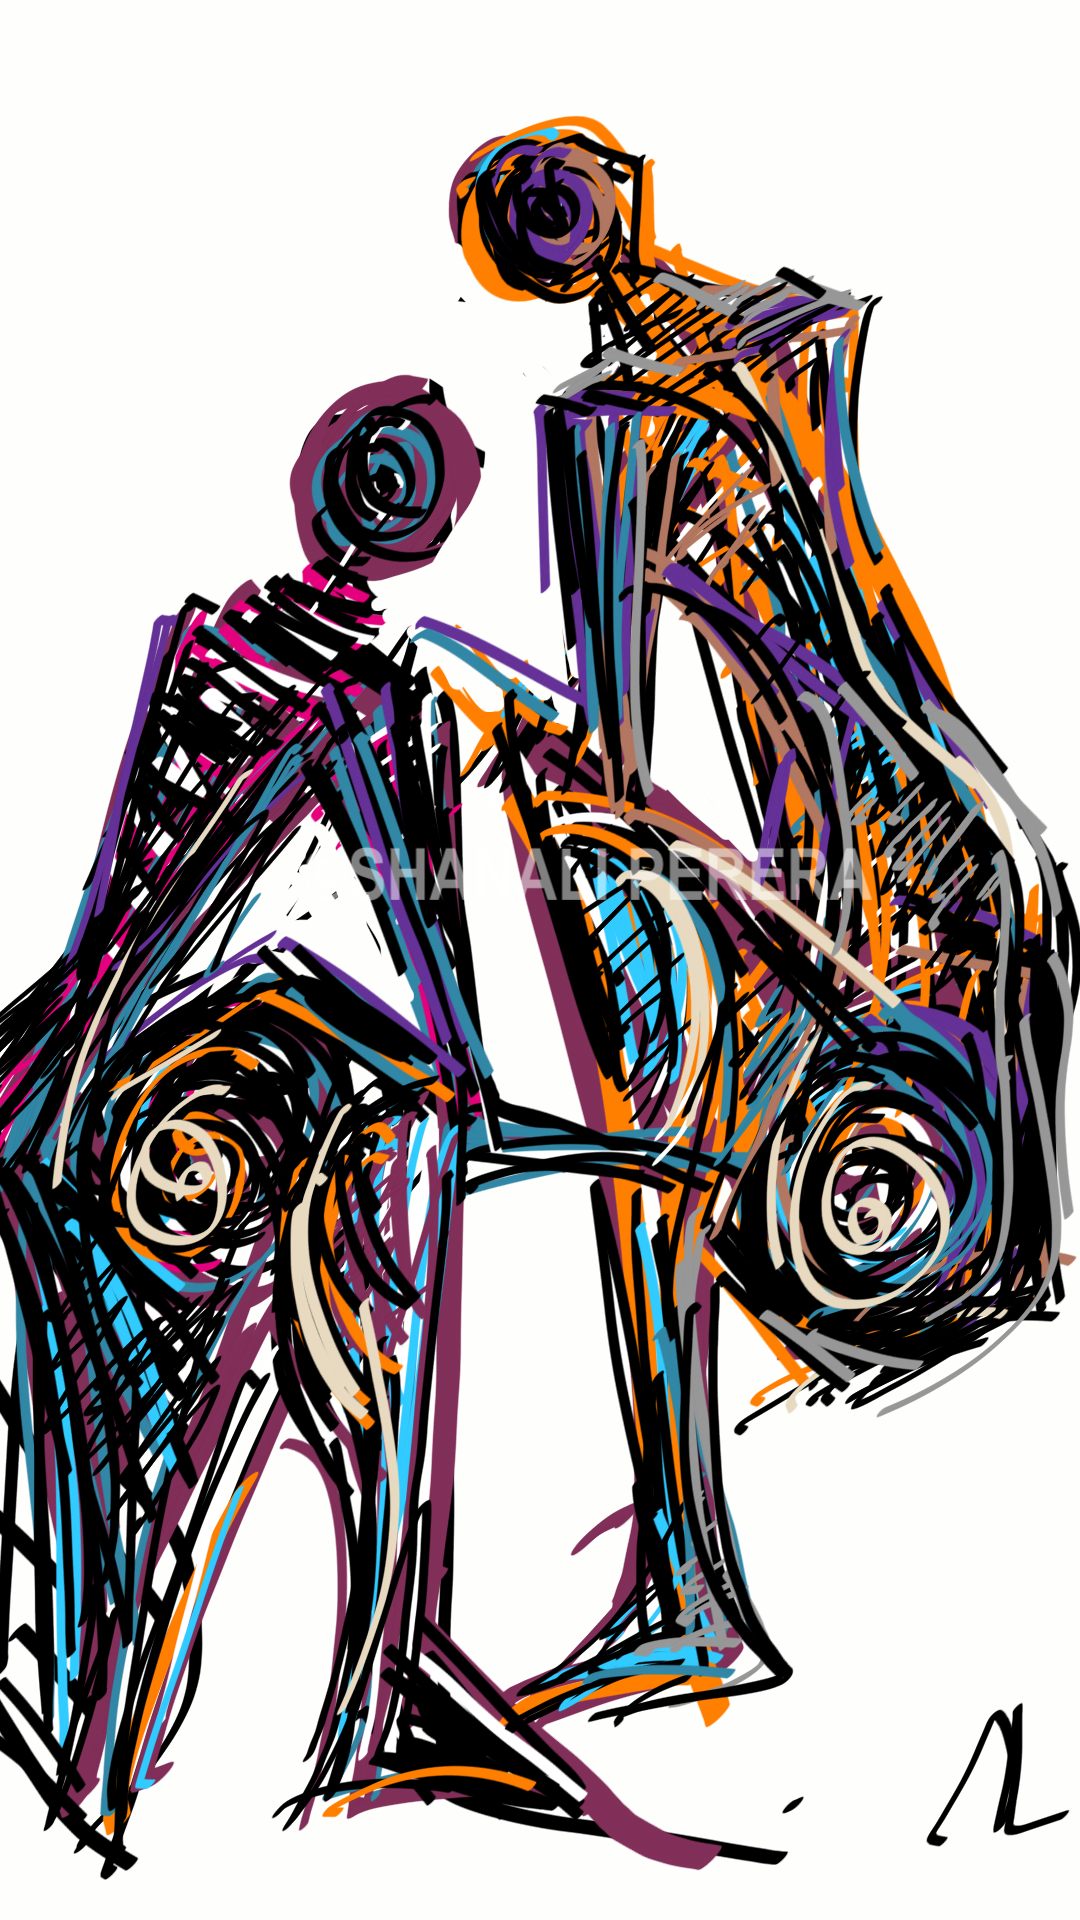 sketch-1508180259776.png